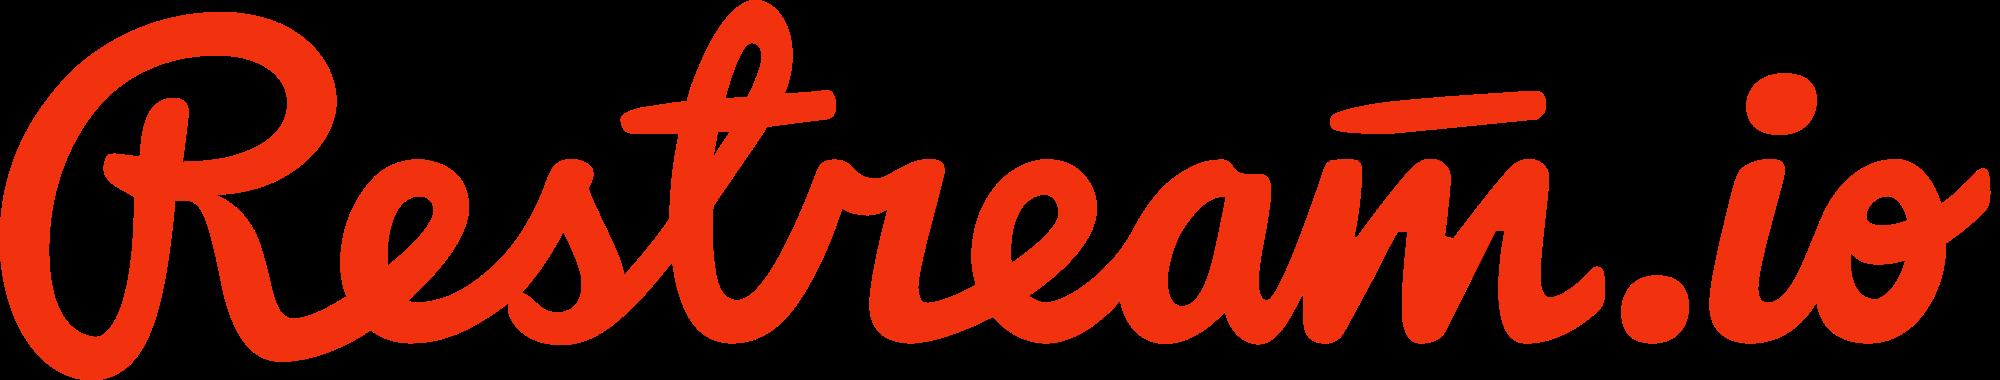 Restream_logo.svg.png